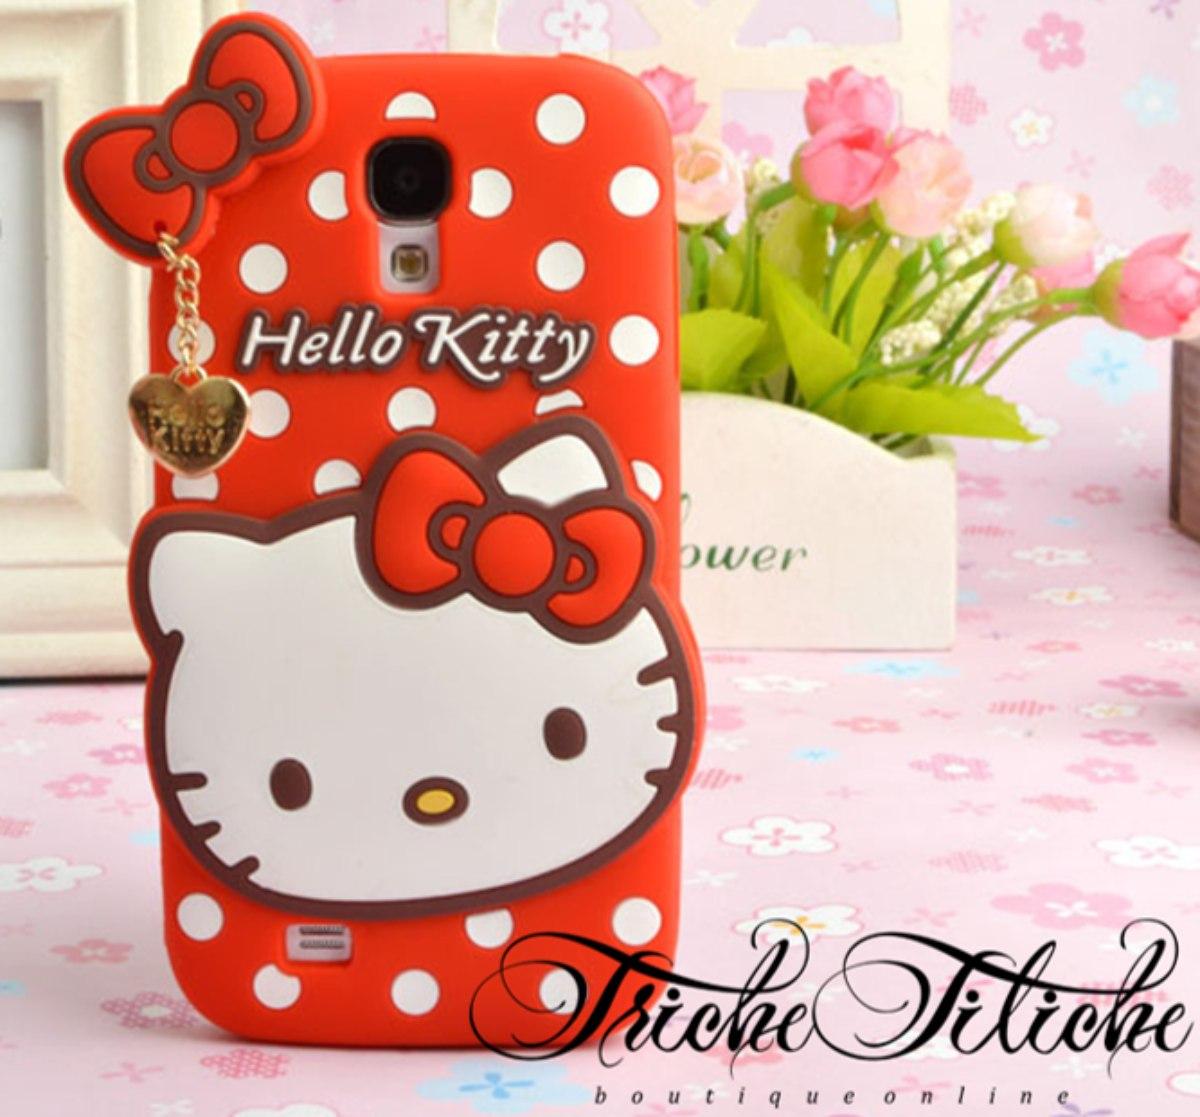 811bb69817a Funda / Botarga Hello Kitty Galaxy S5 | Triche